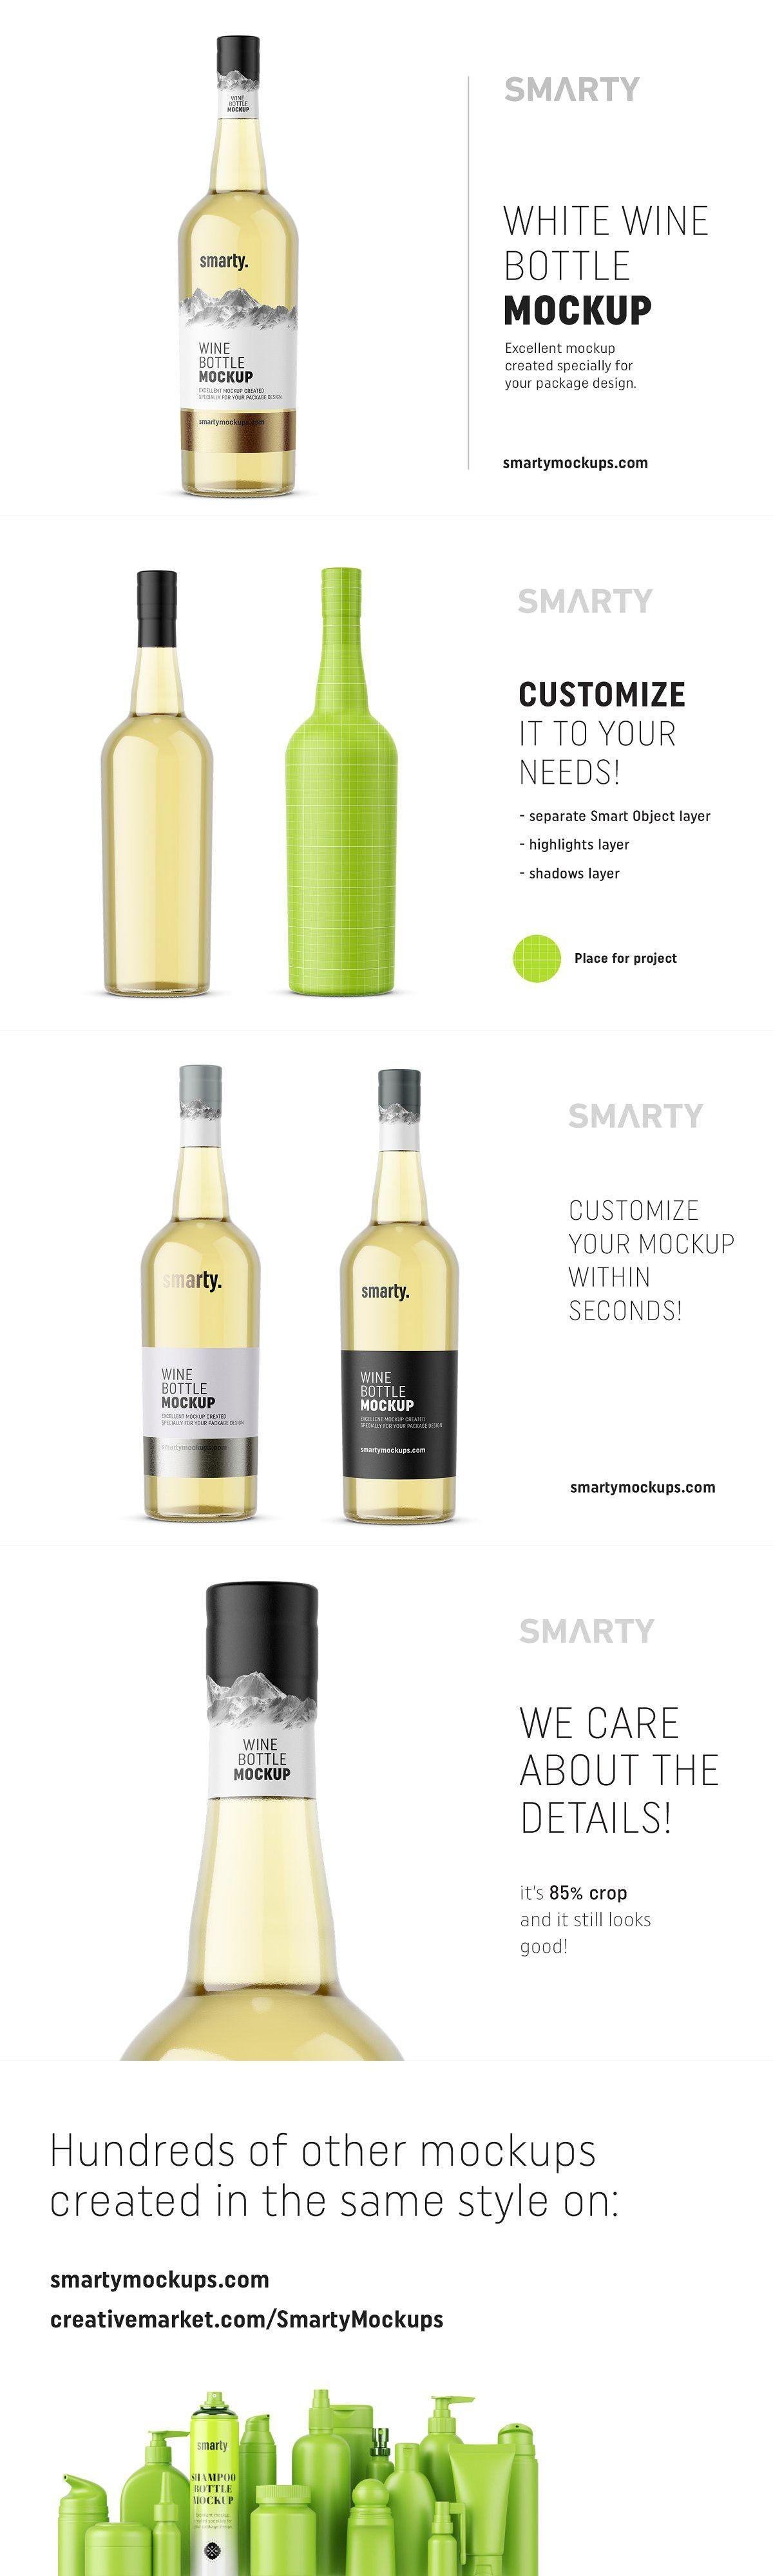 White Wine Bottle Mockup Bottle Mockup Wine Bottle White Wine